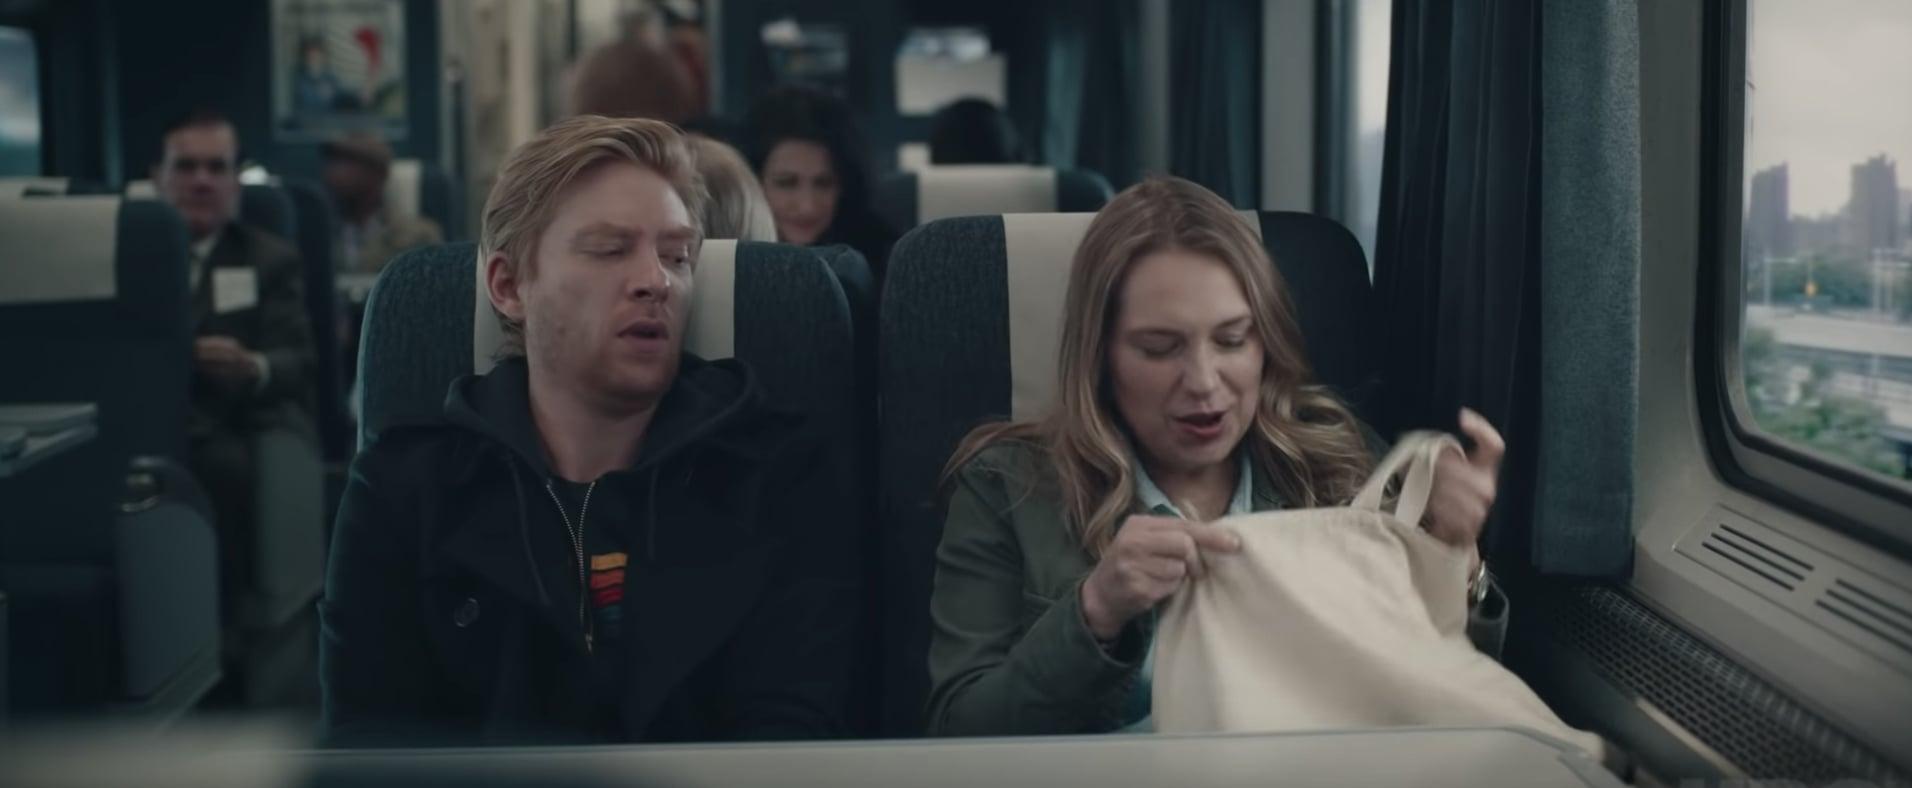 HBO Run Series (2020) Official Teaser Trailer